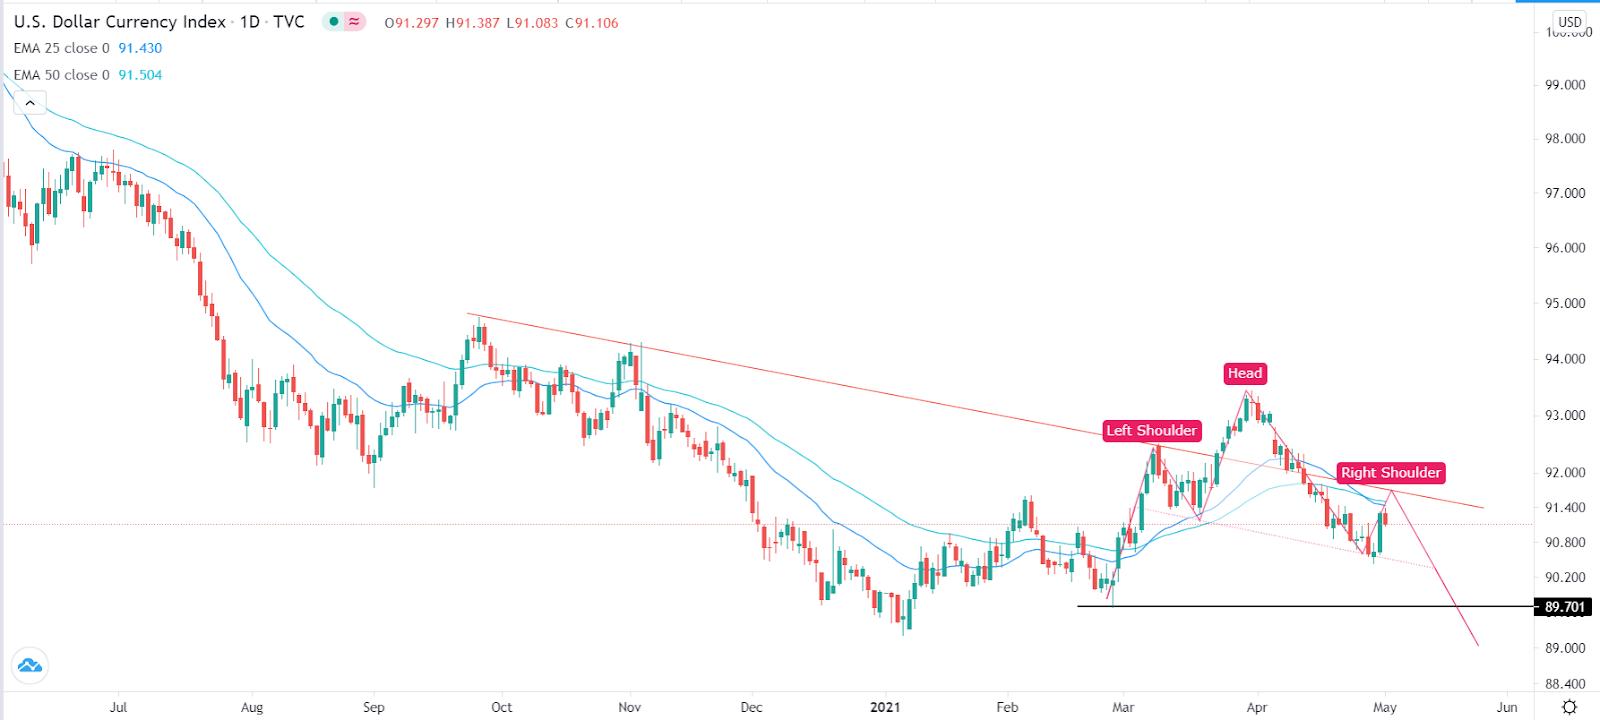 Índice del dólar